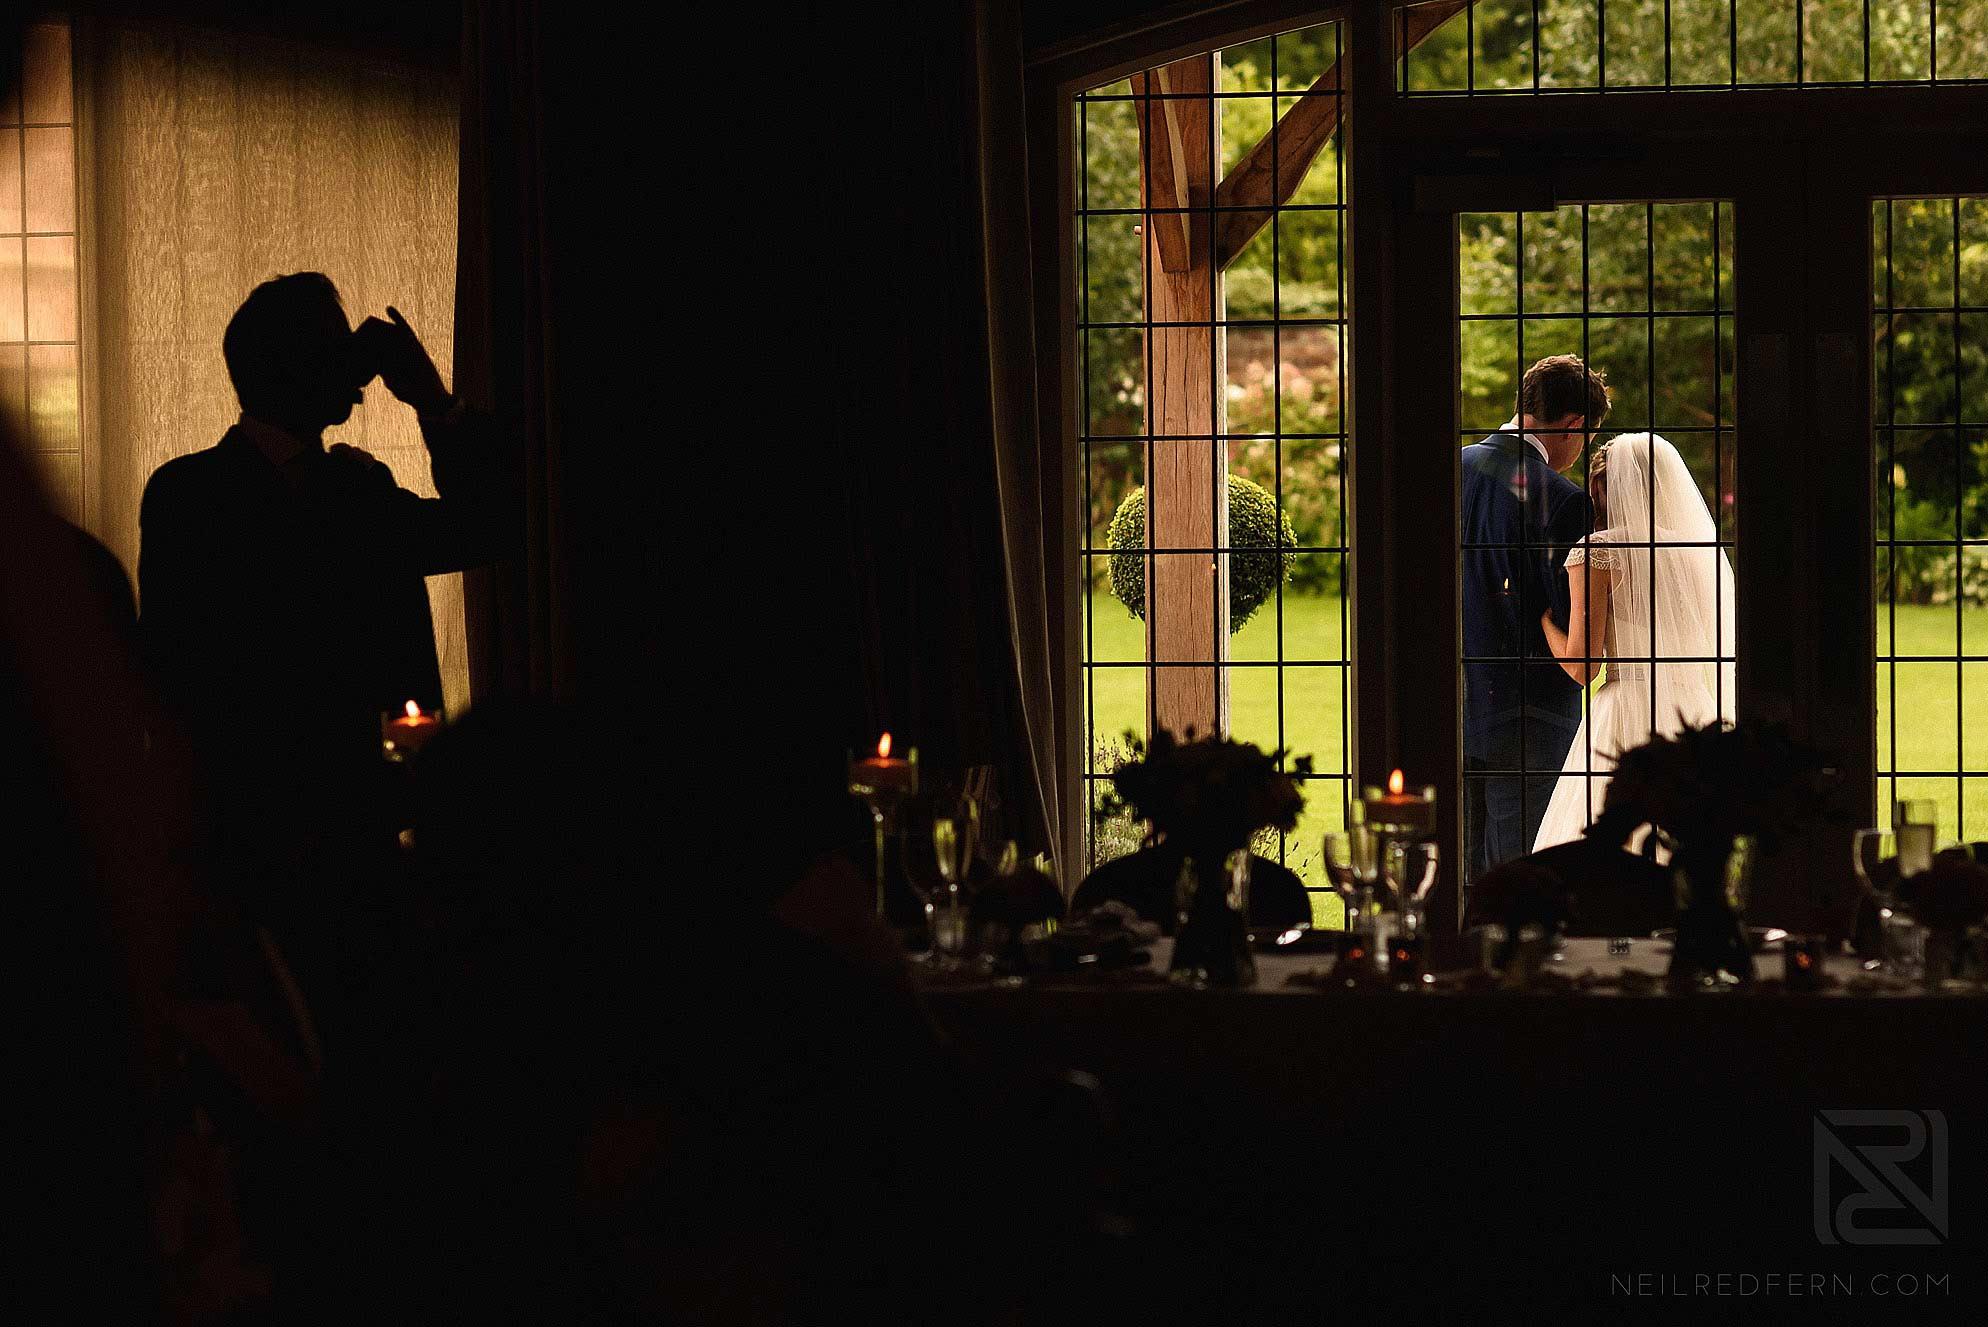 colshaw-hall-wedding-photographs-22